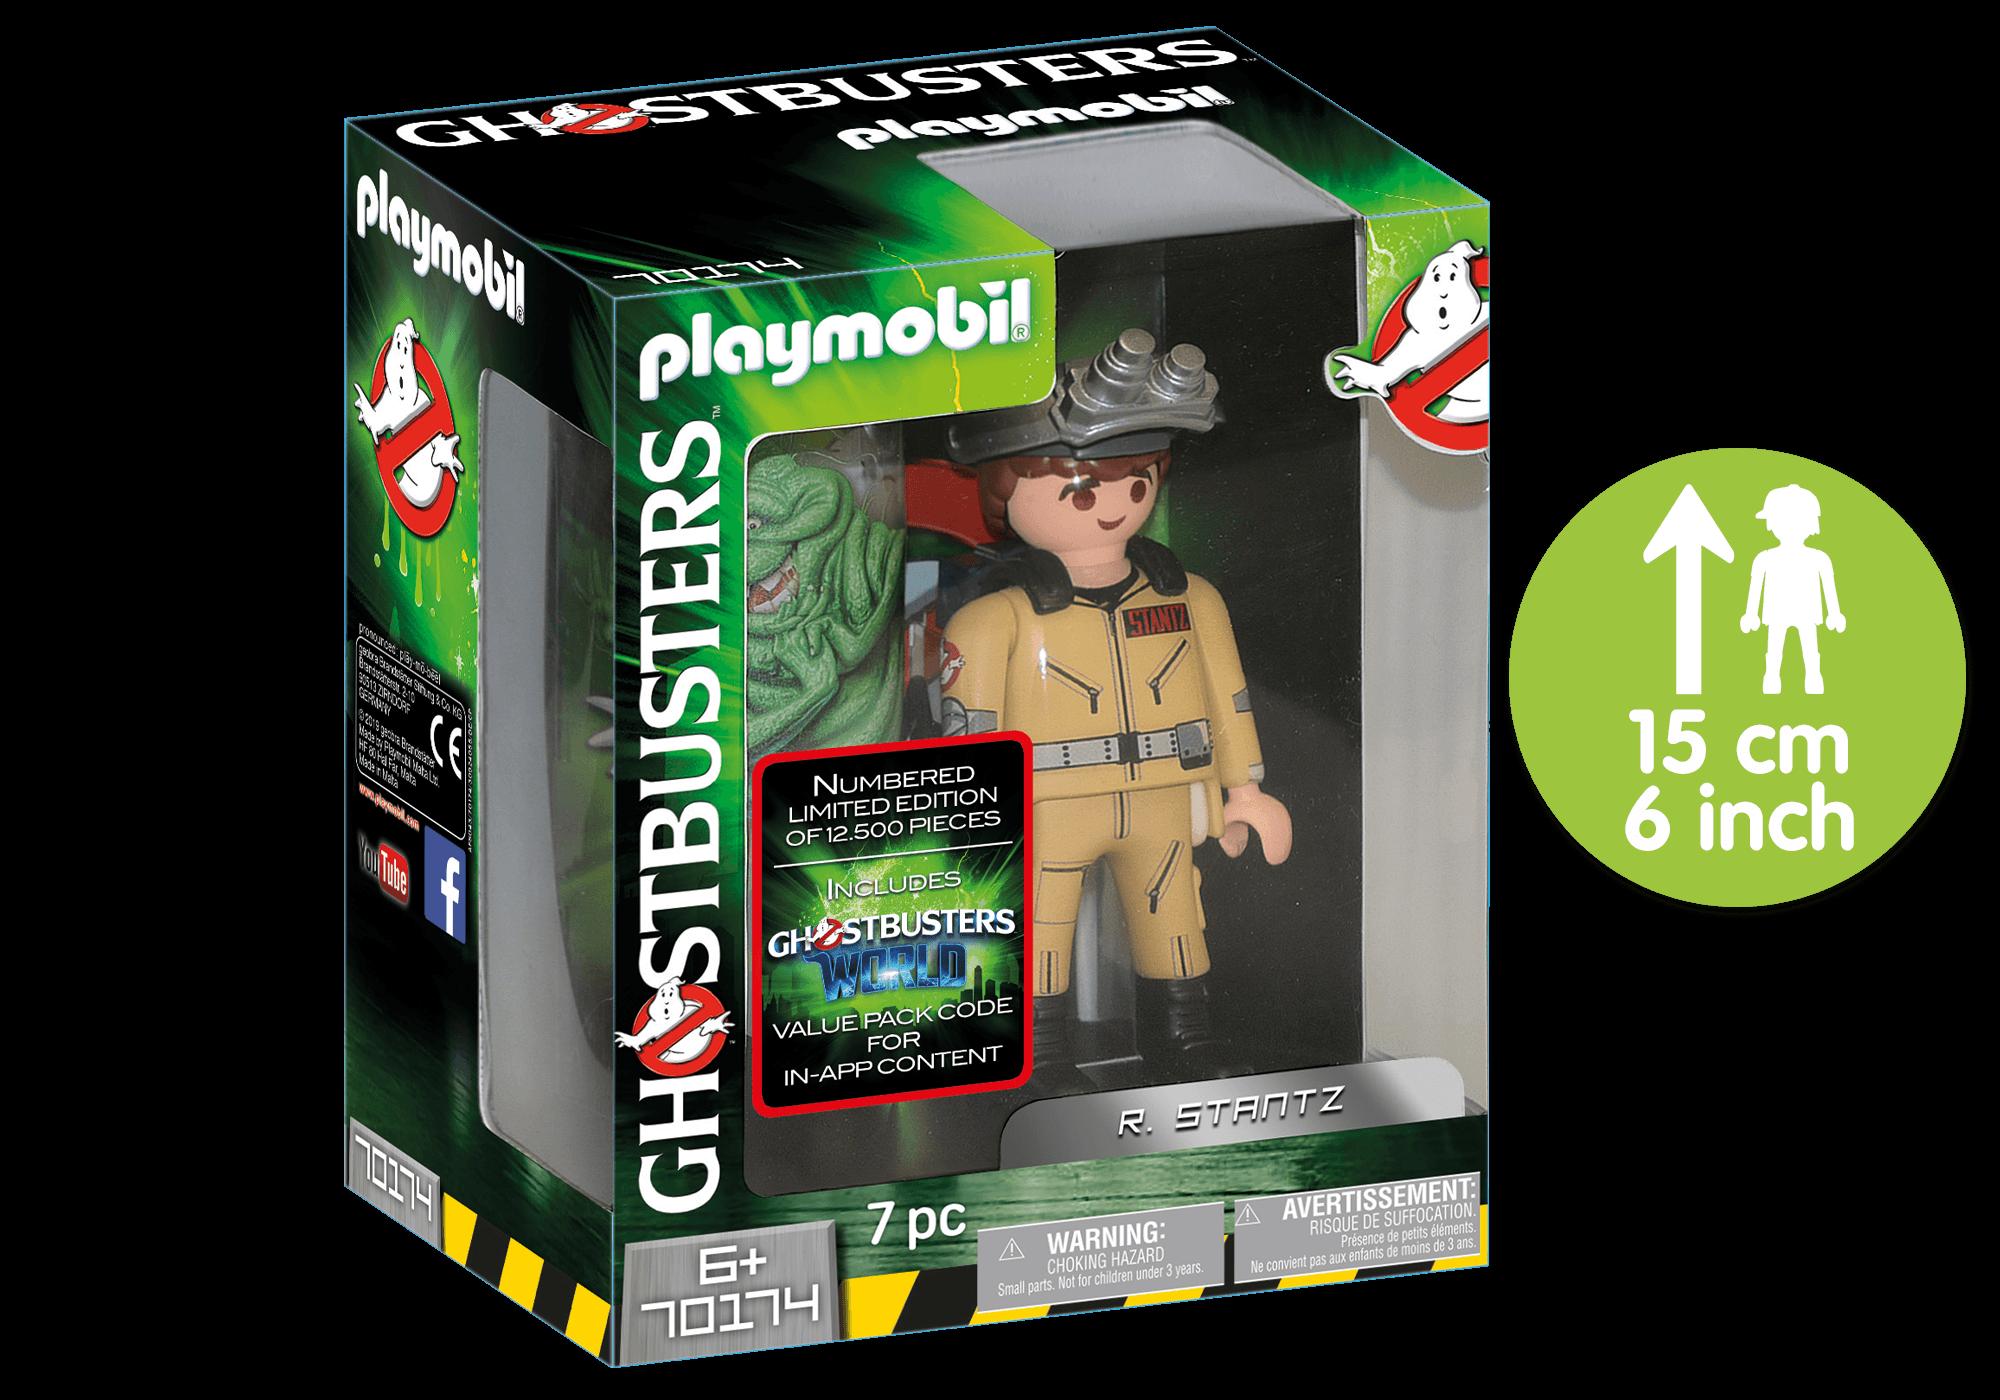 70174_product_detail/Ghostbusters™ Συλλεκτική φιγούρα Ρέι Σταντζ